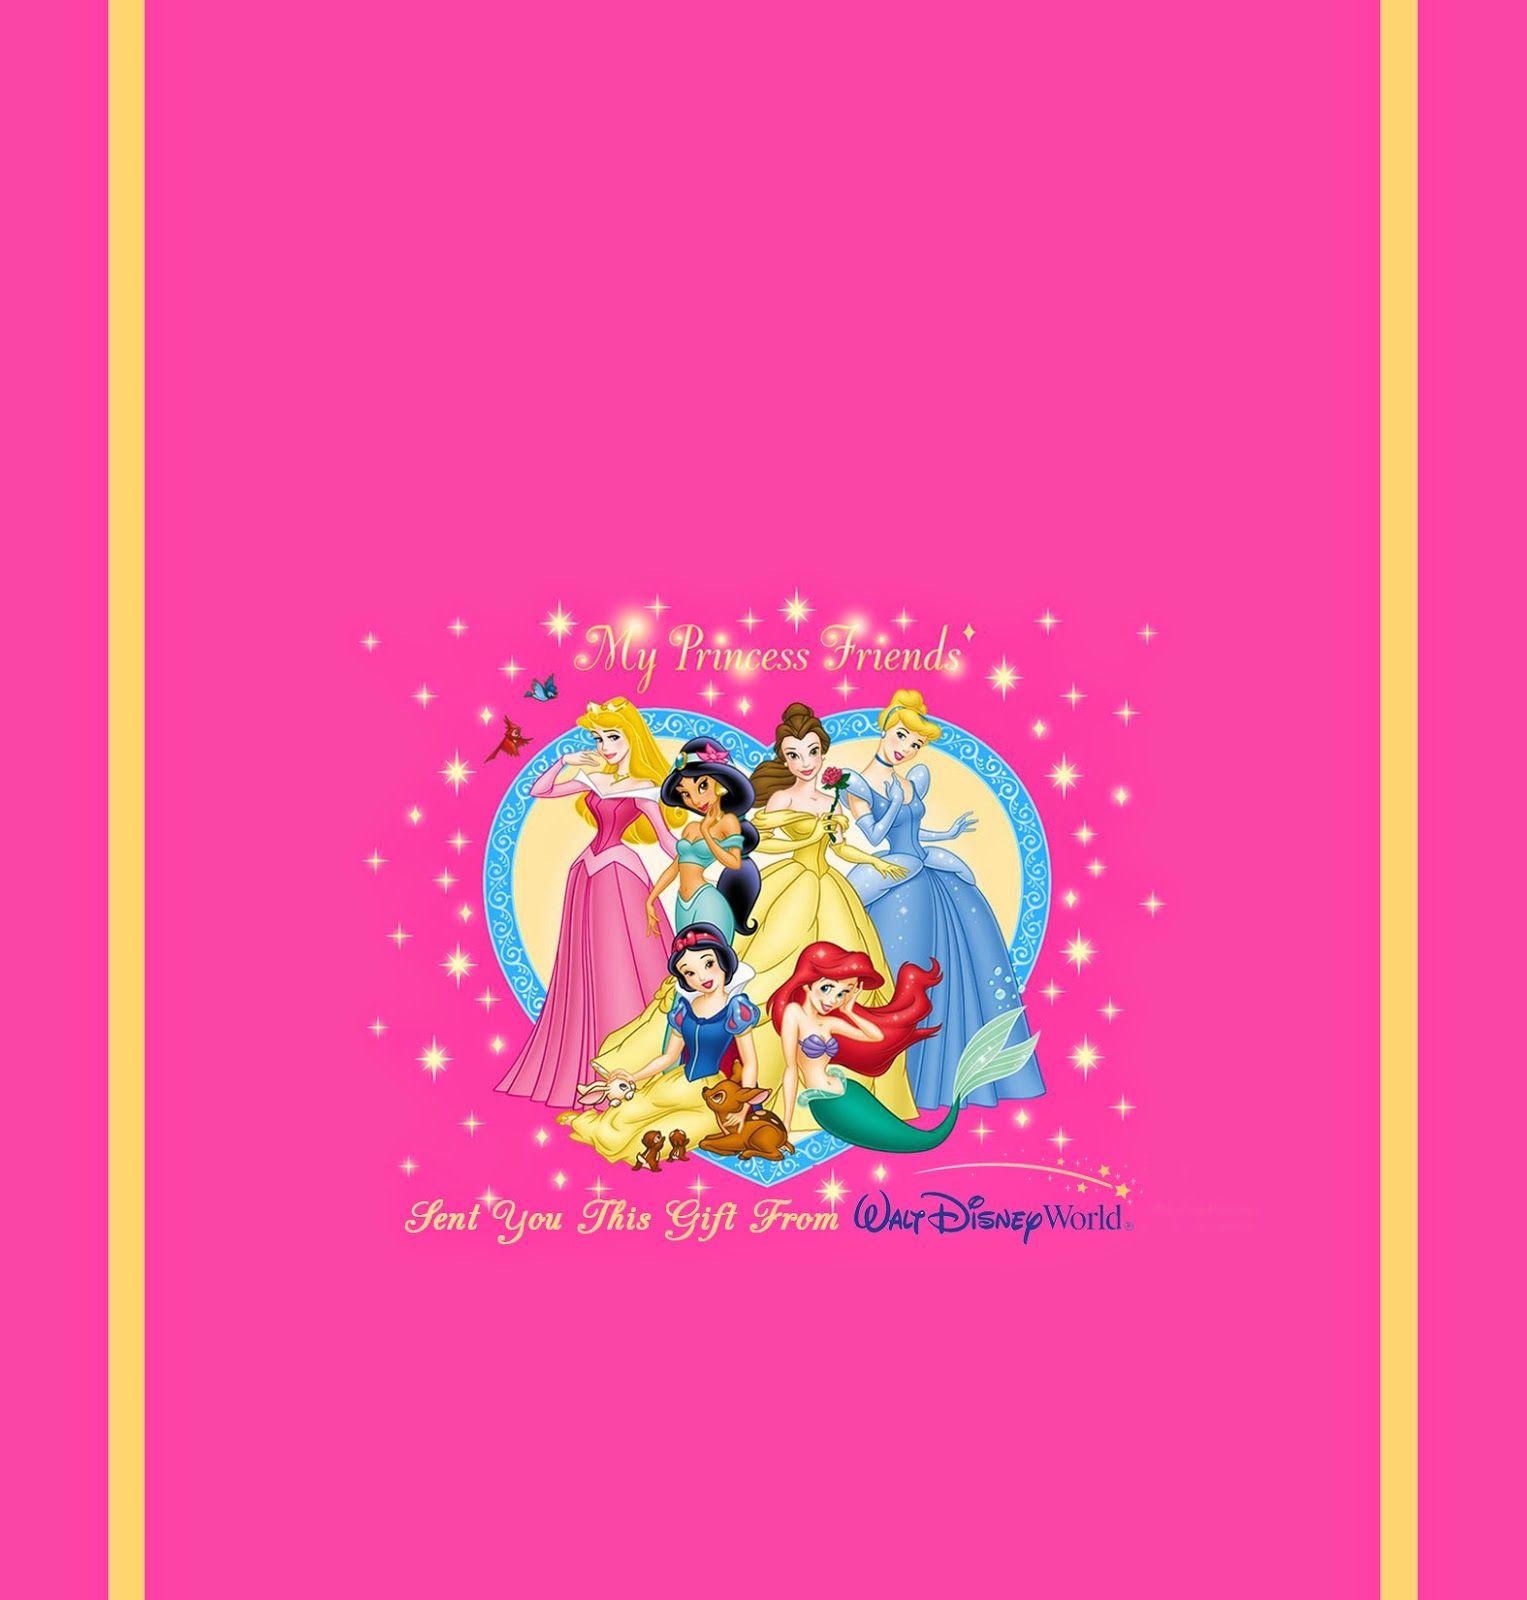 Disney Princess Free Printable Chocolate Wrappers